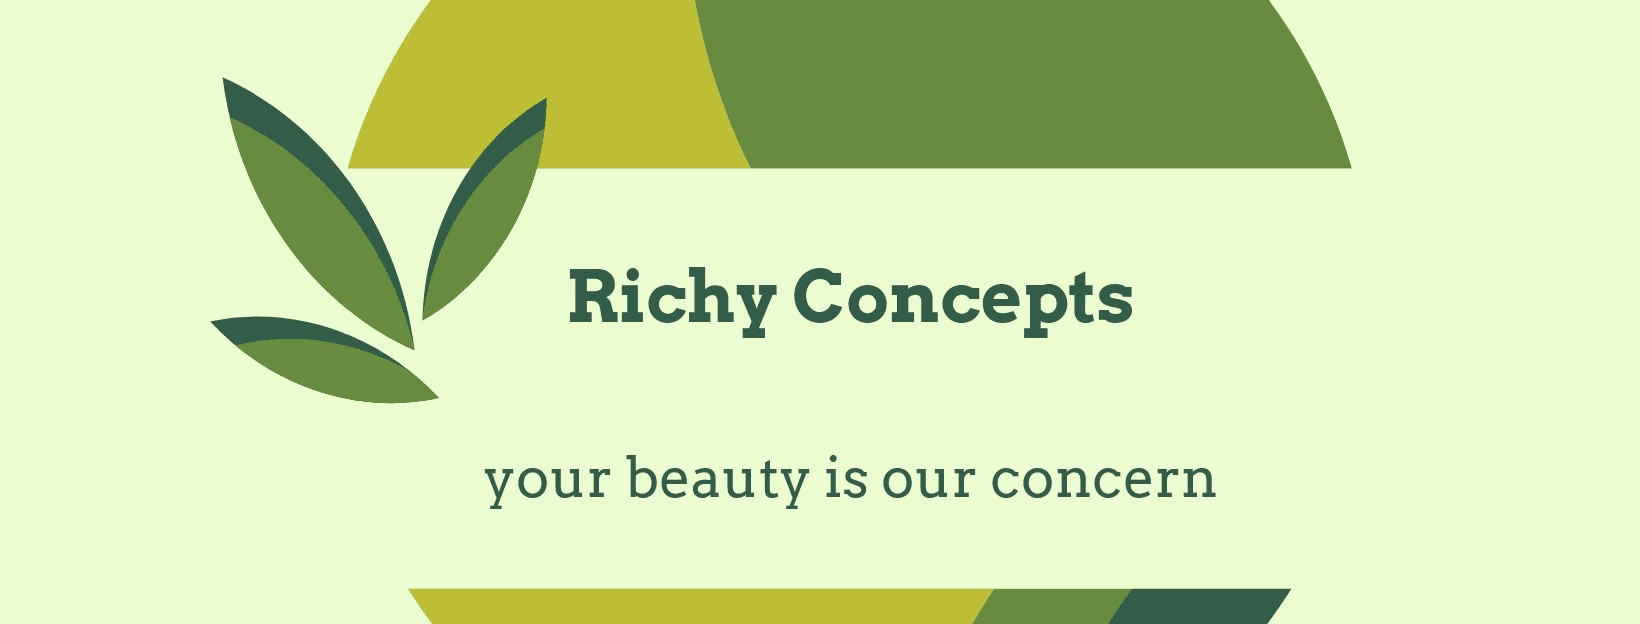 Richy Concepts